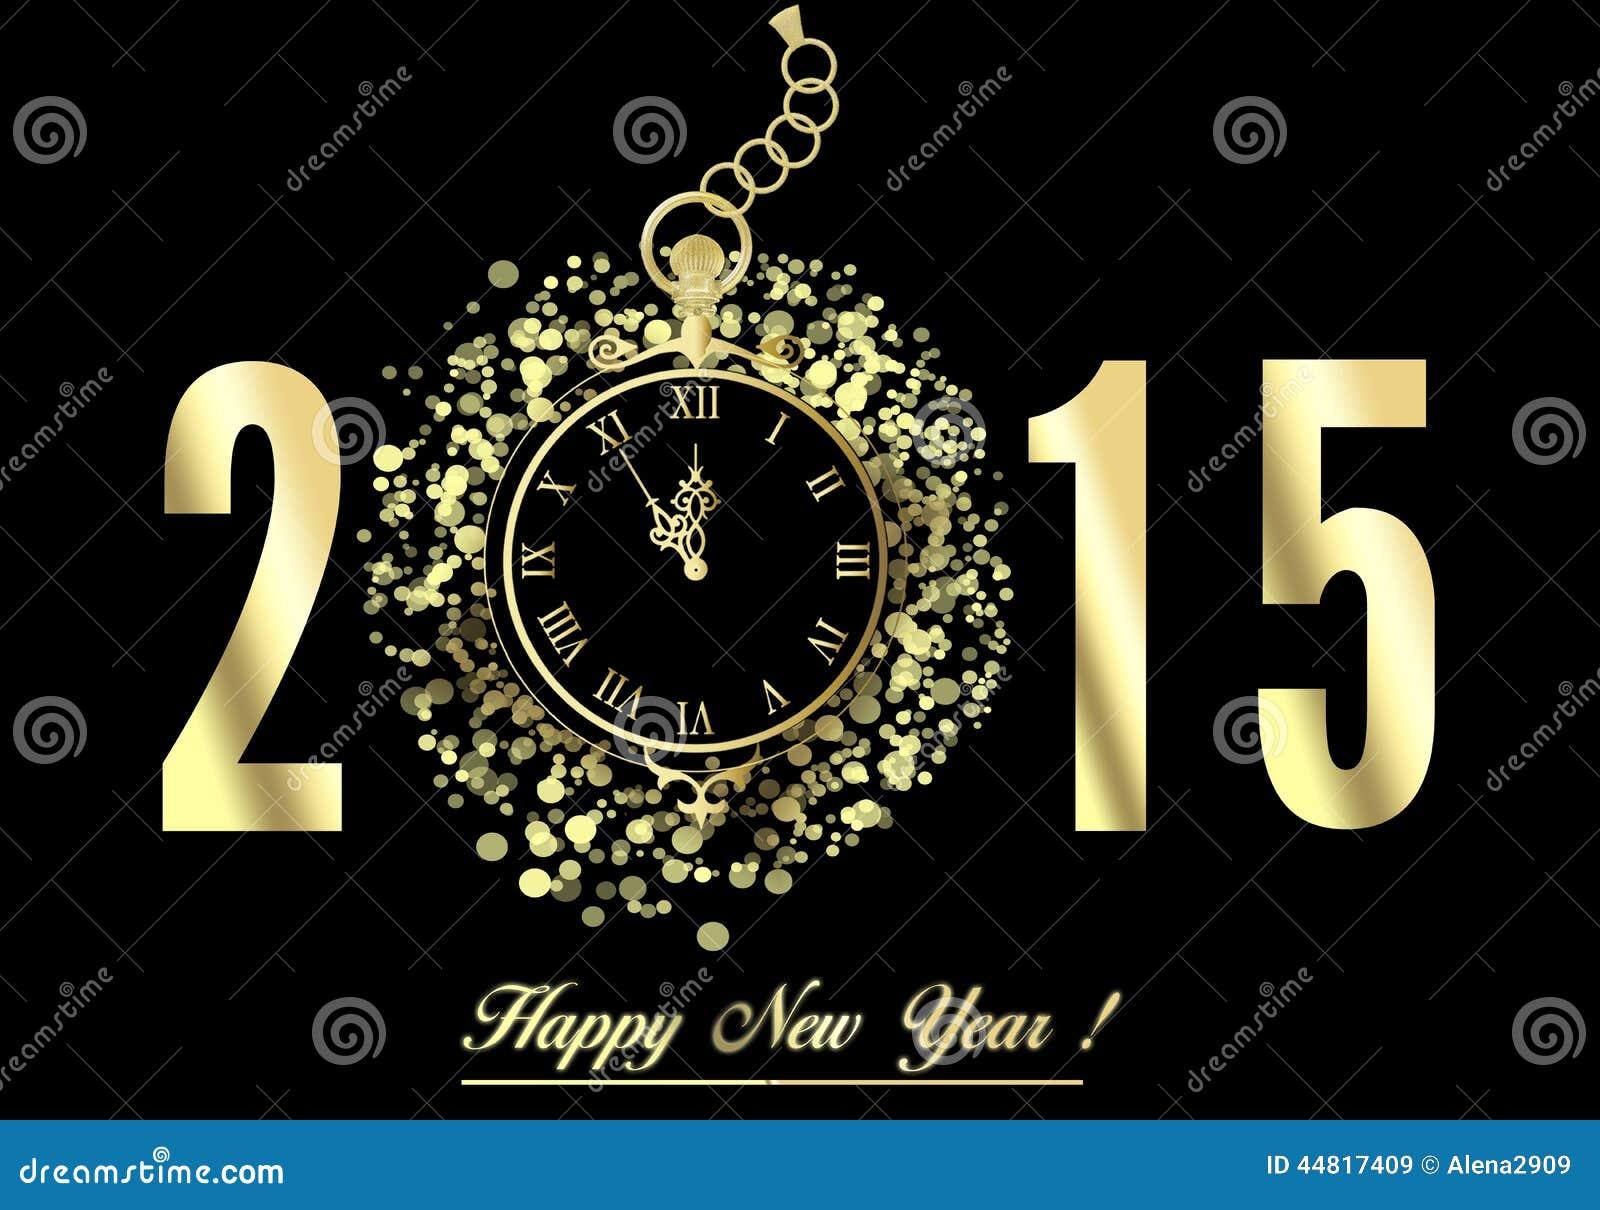 Happy New Year 2015 Stock Illustration Illustration Of Banner